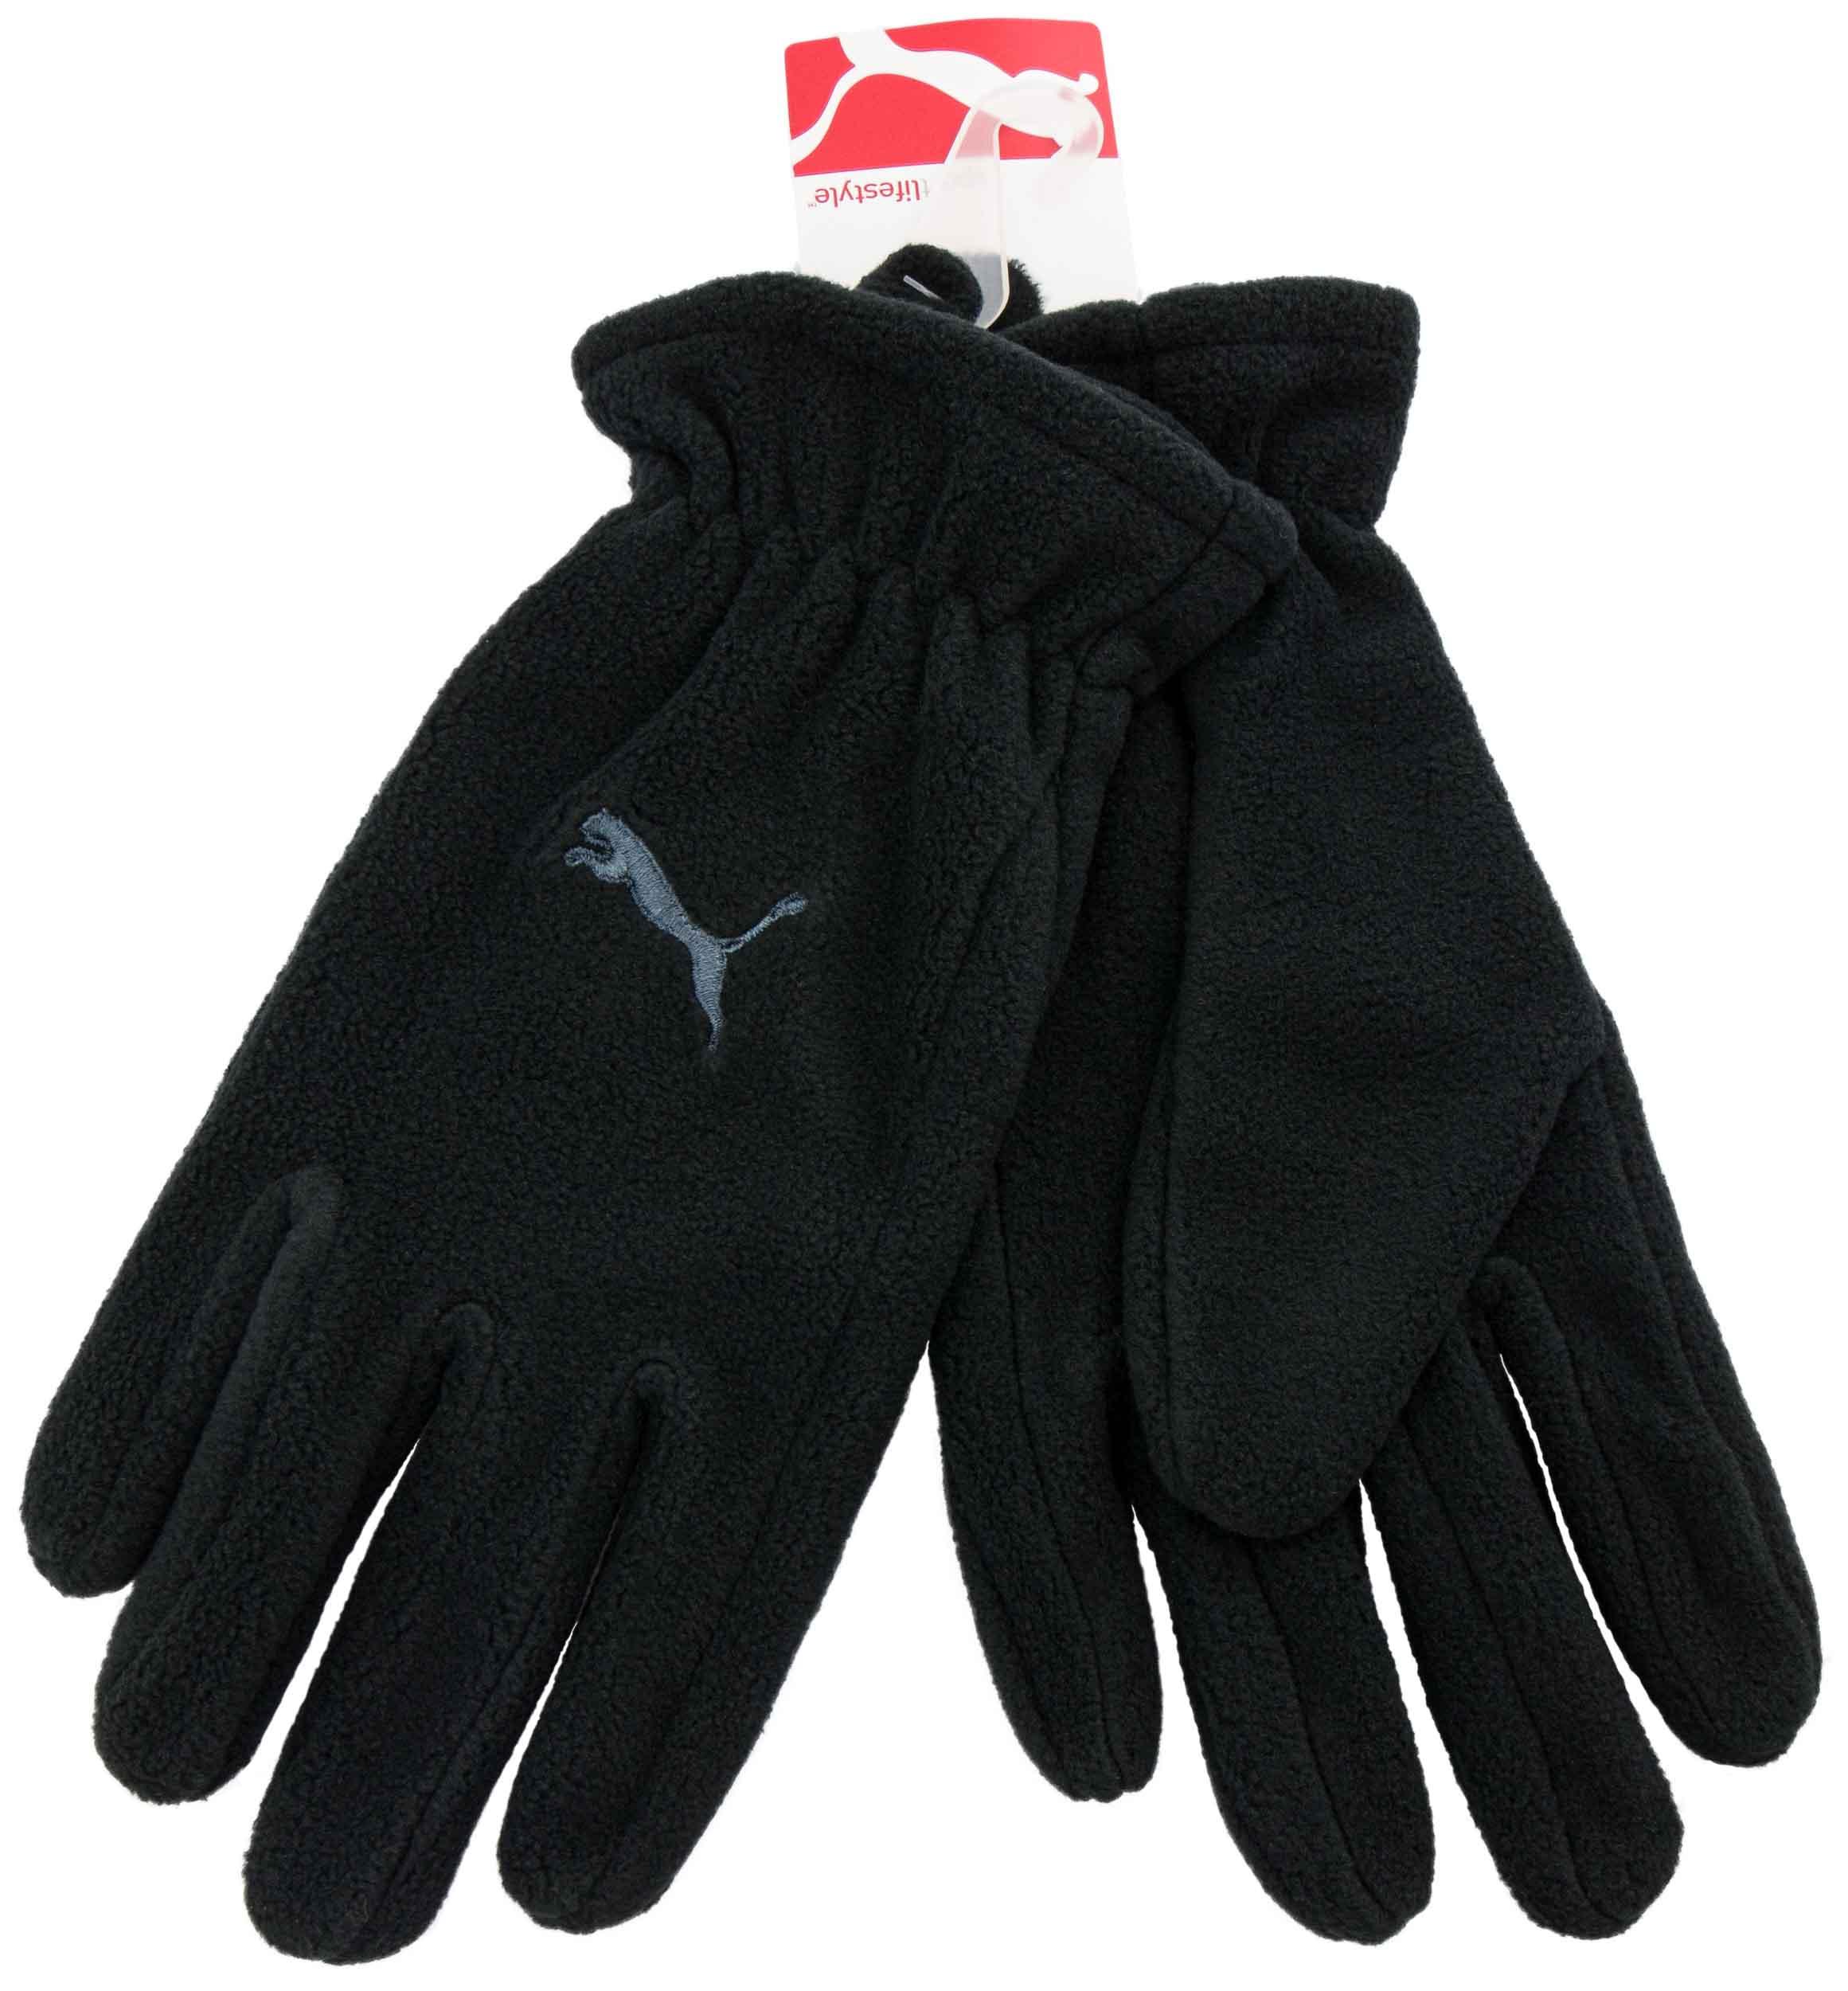 Rukavice Puma Fleece Gloves